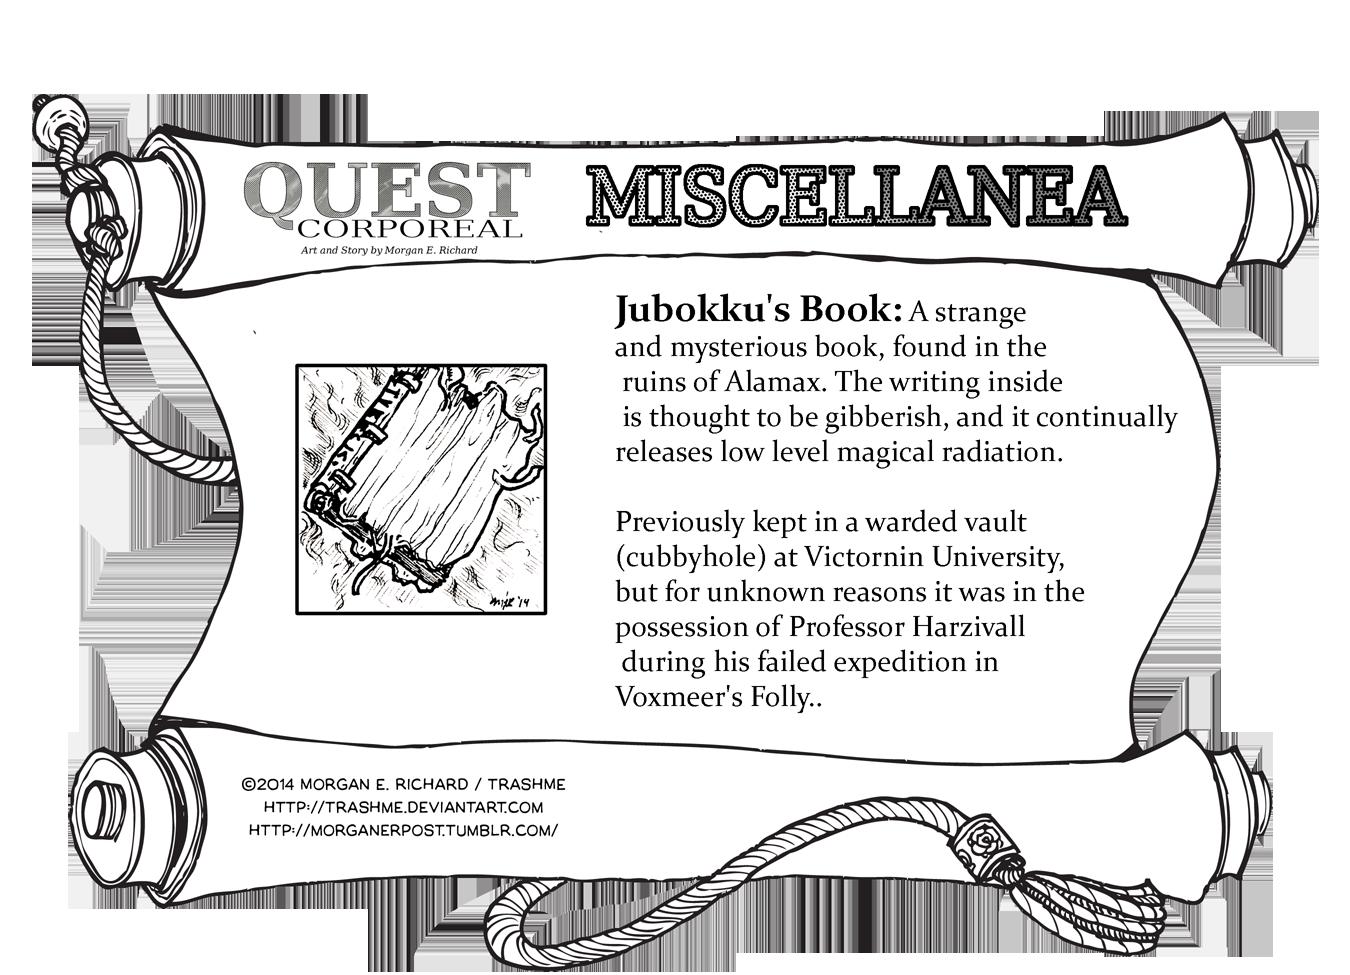 Miscellanea Corporeal: Jubokku's Book